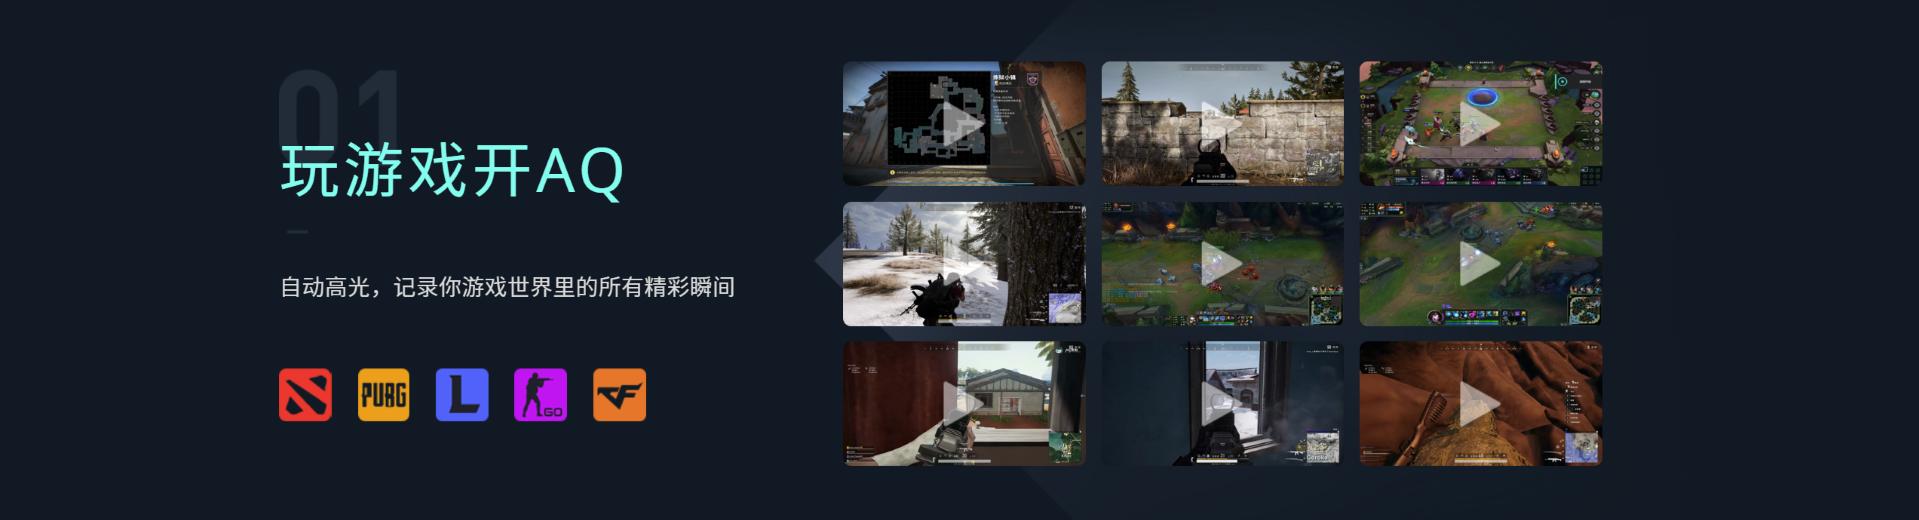 AQ录制-官网首页顶部横幅宣传图2